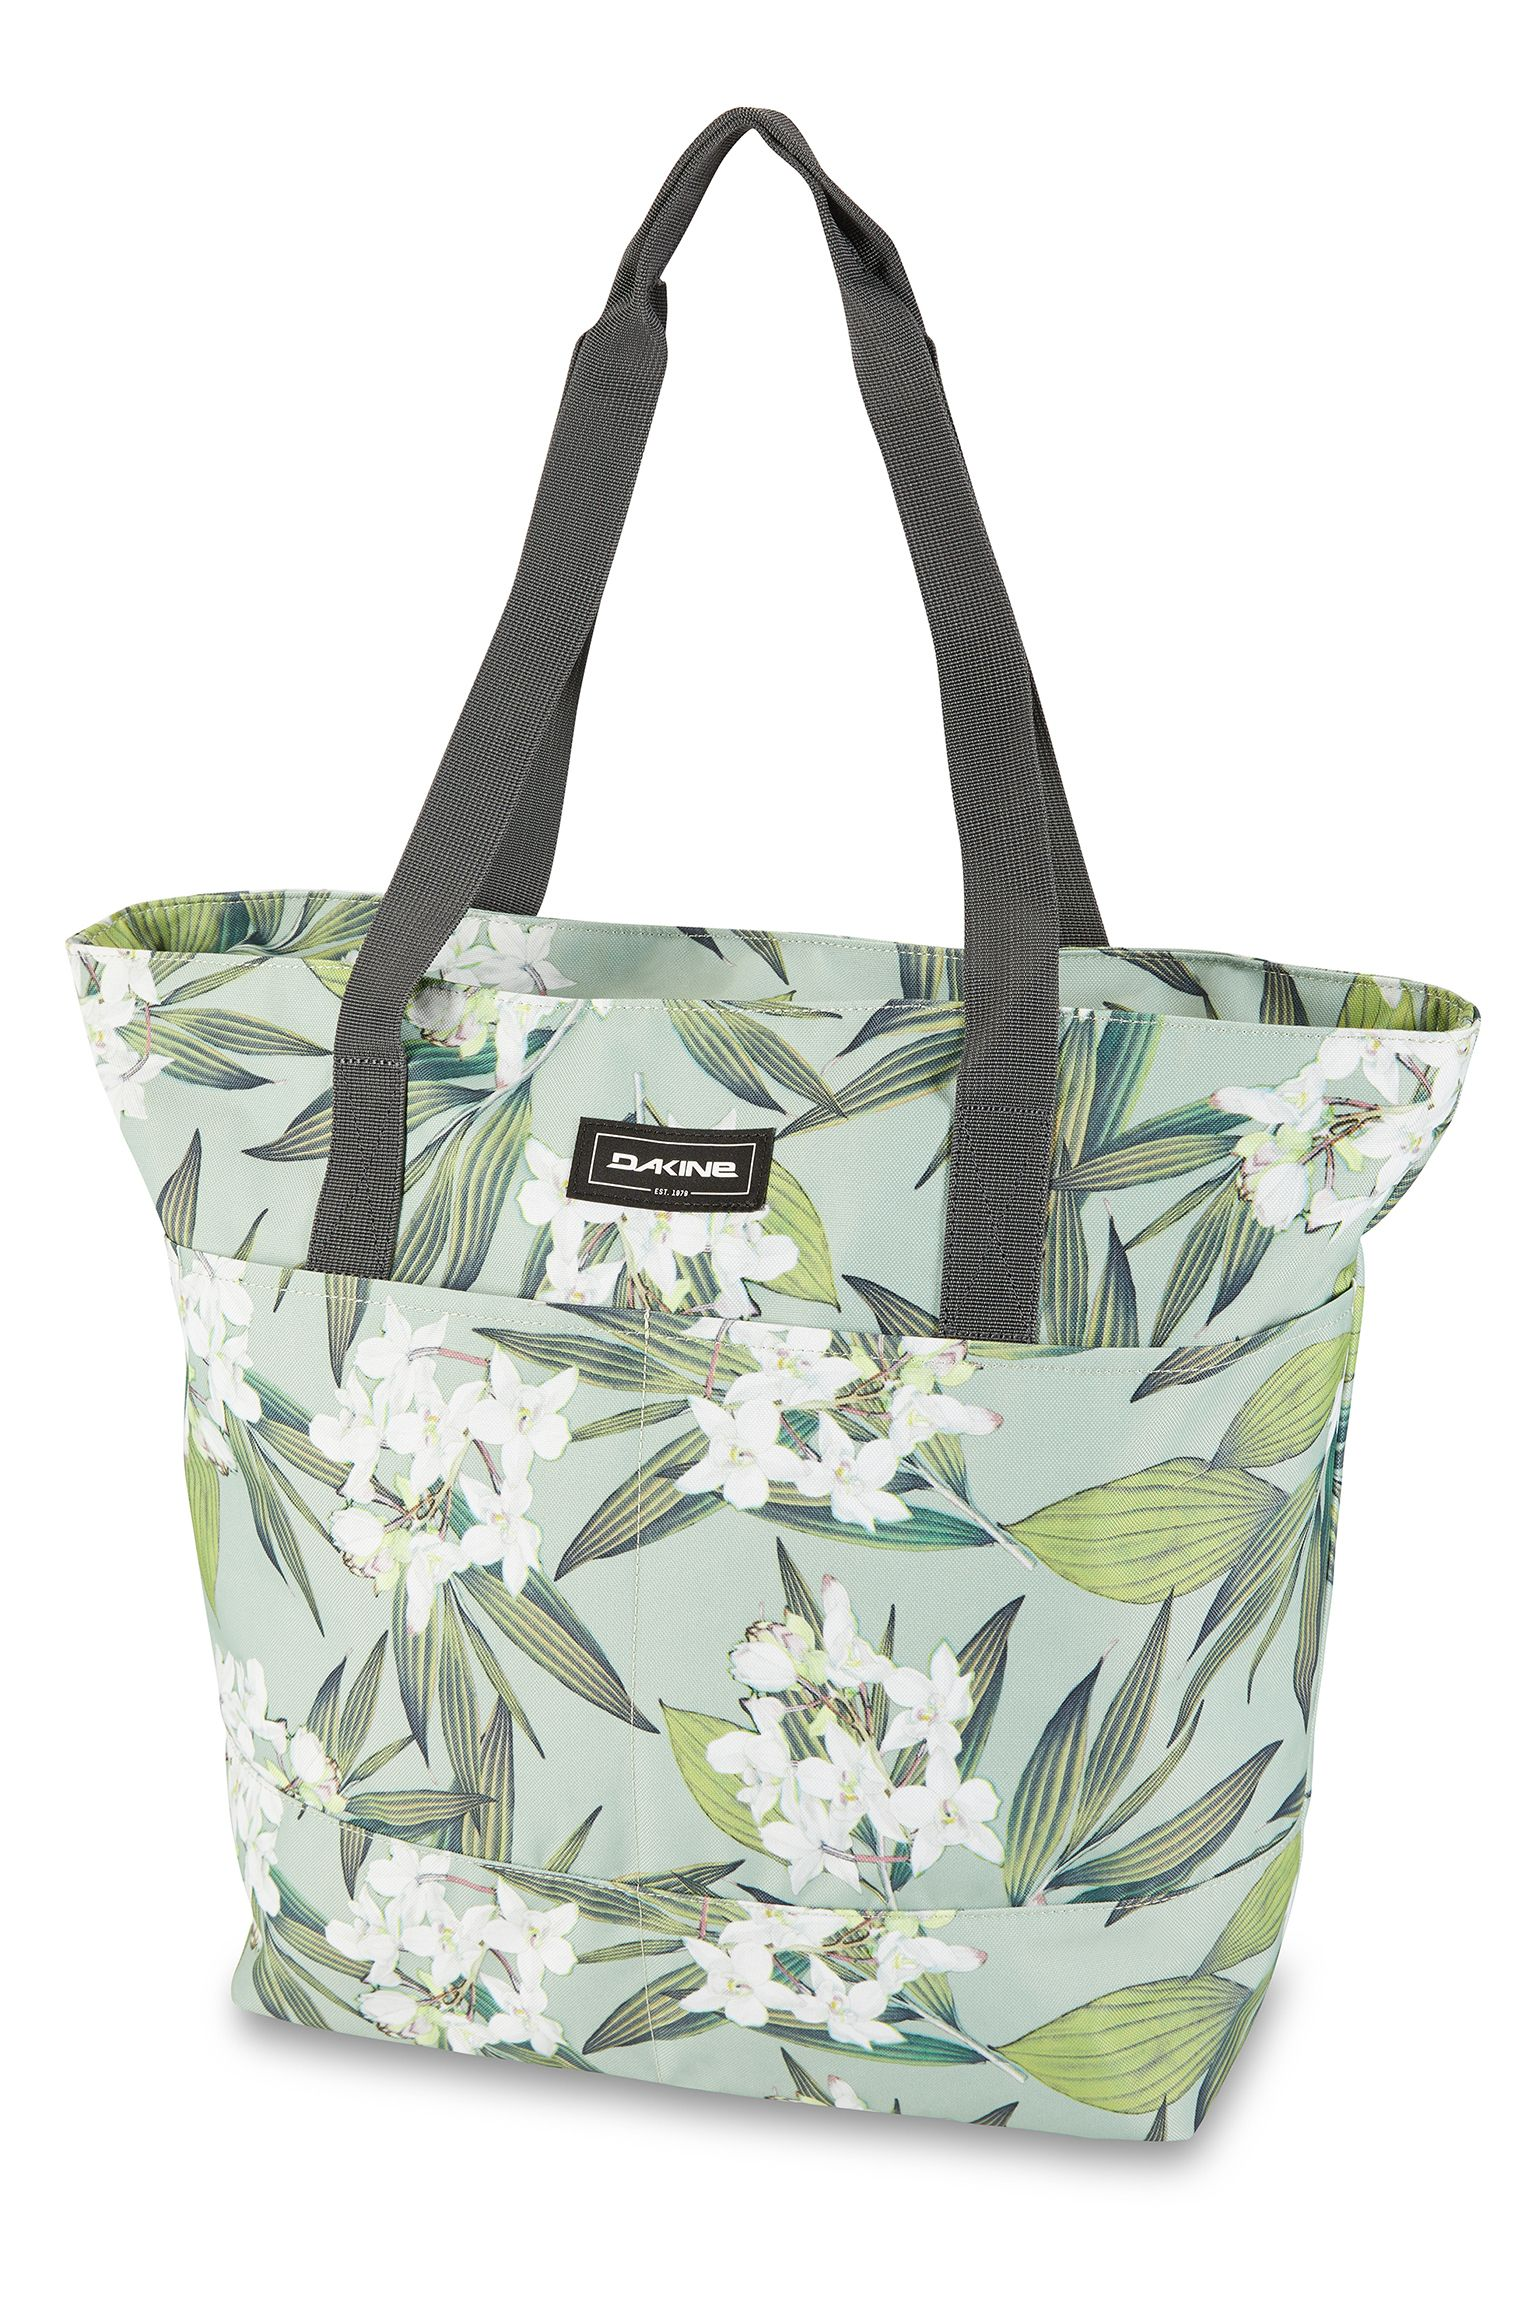 Dakine Bag  CLASSIC TOTE 33L Orchid